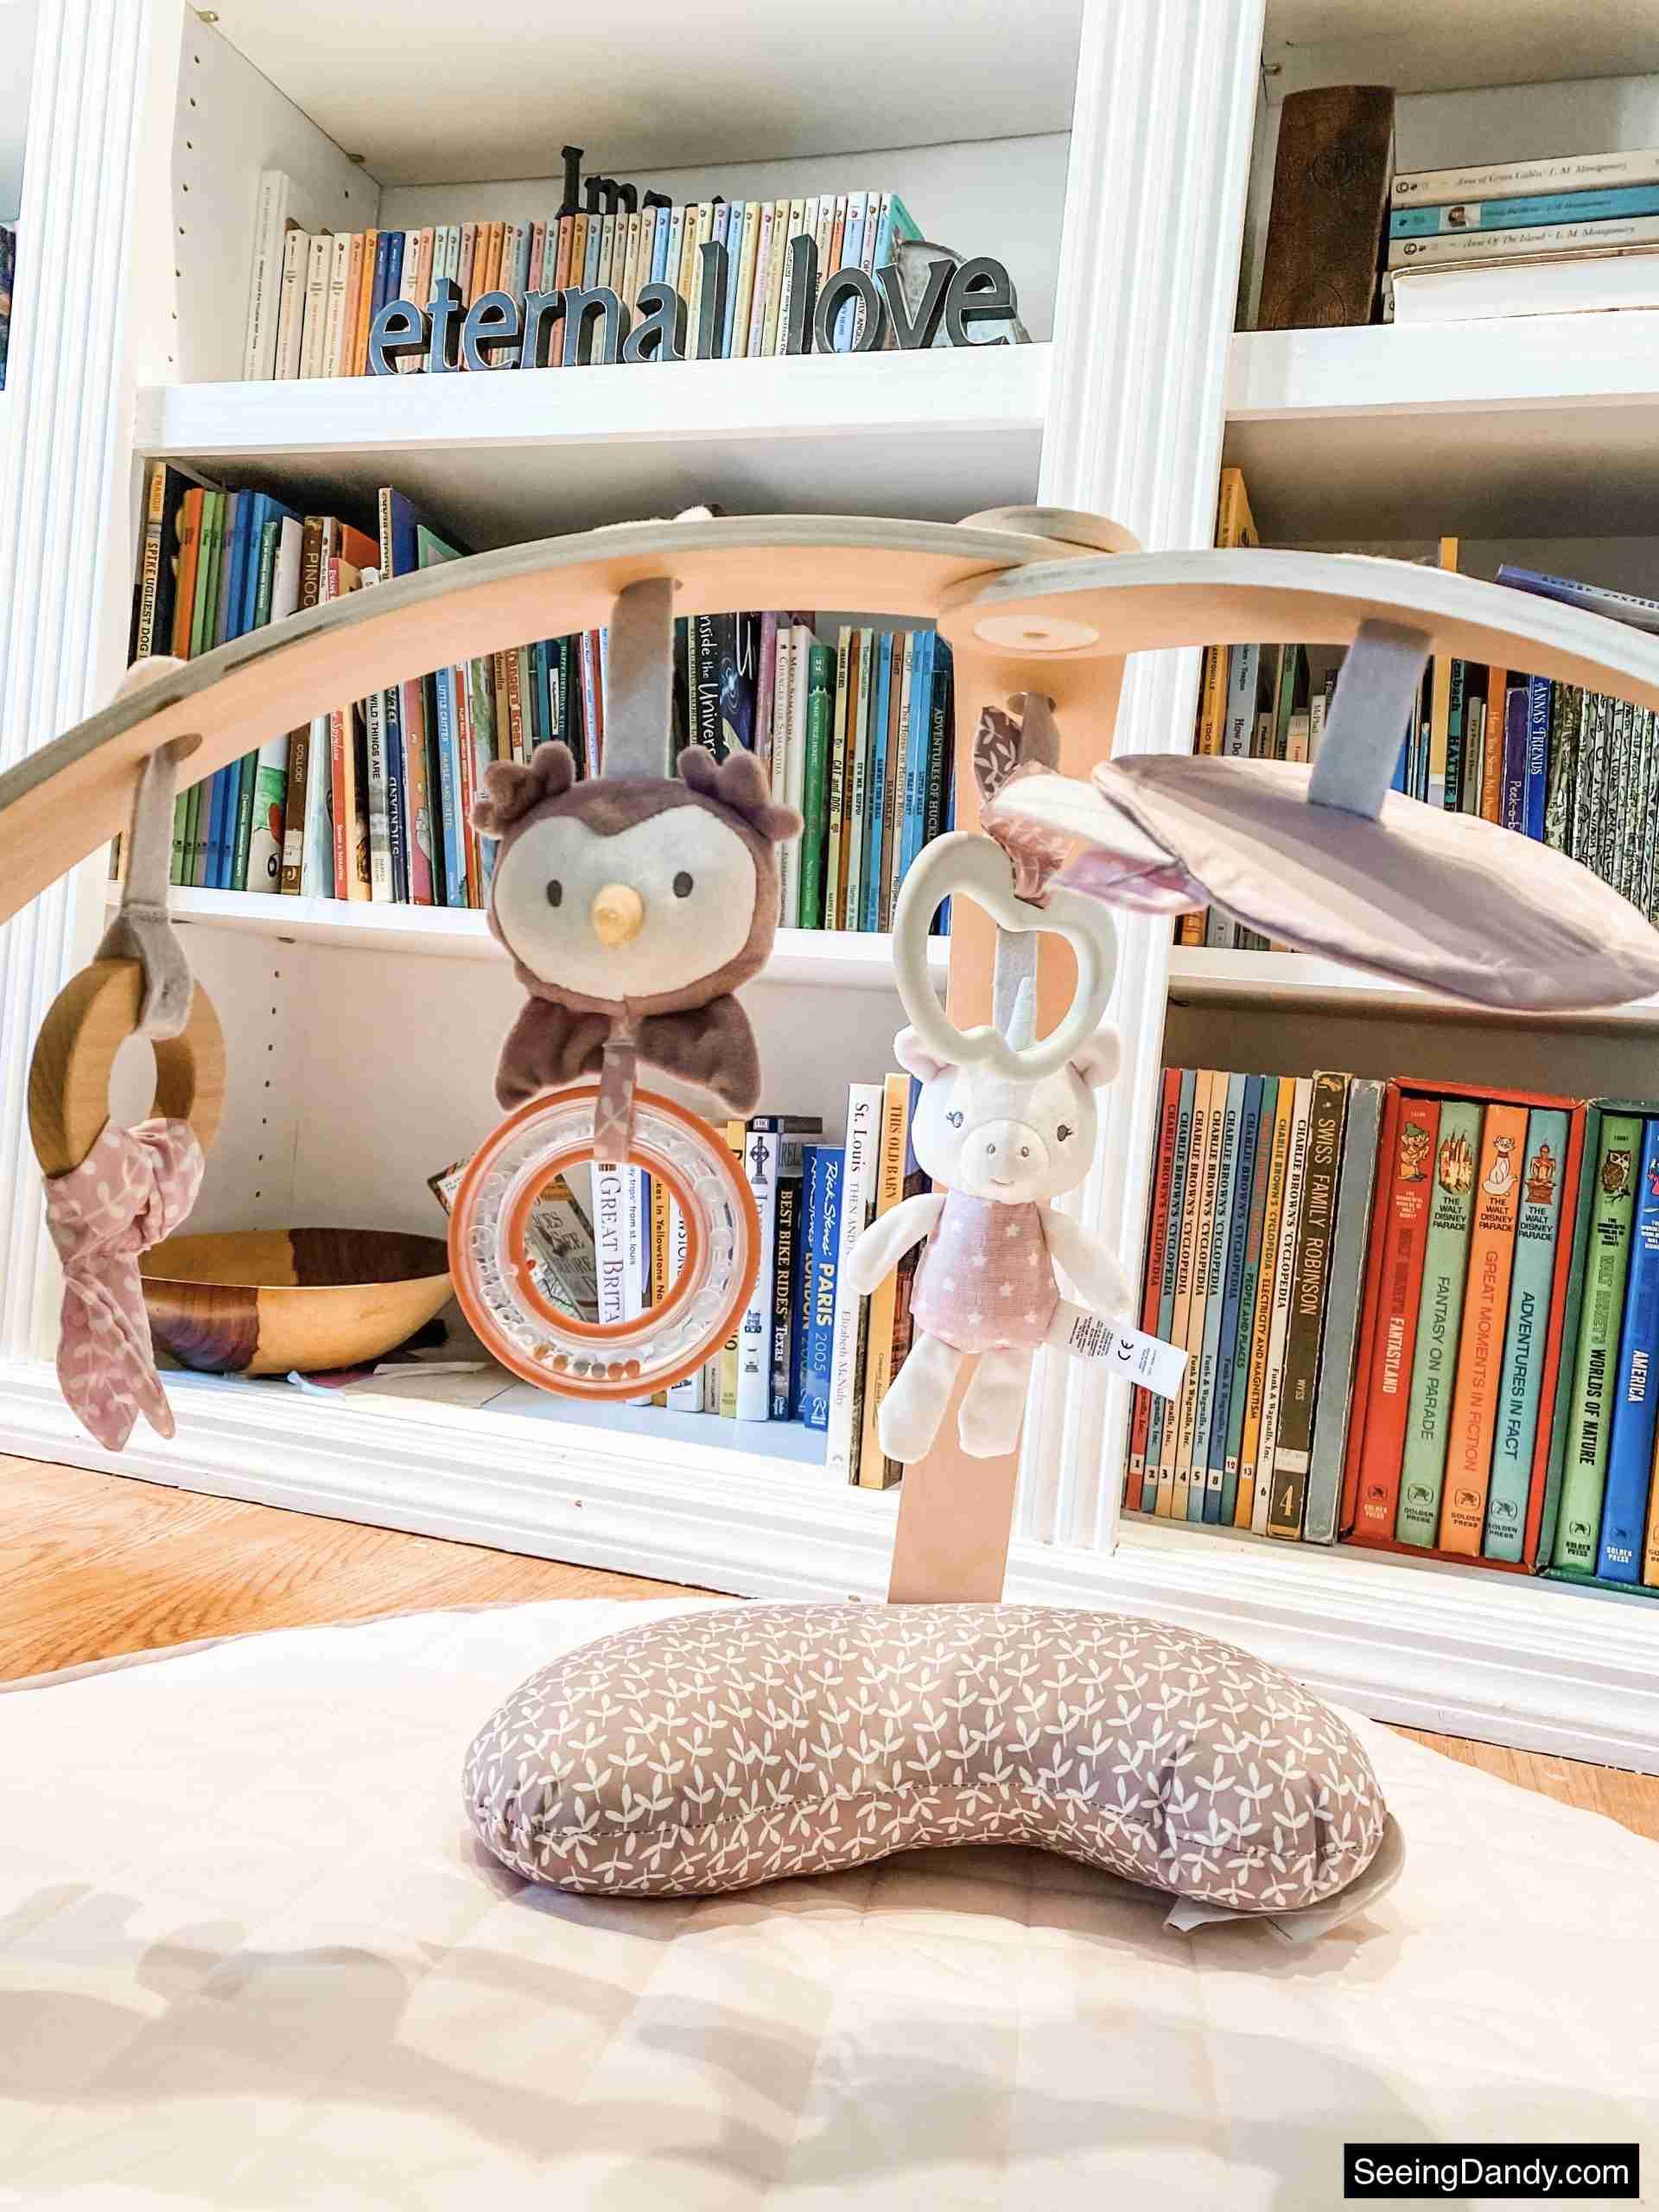 newborn gear, cozy spot activity gym, white bookcases, vintage disney books, calla duvet play mat, infant gift ideas, infant toys